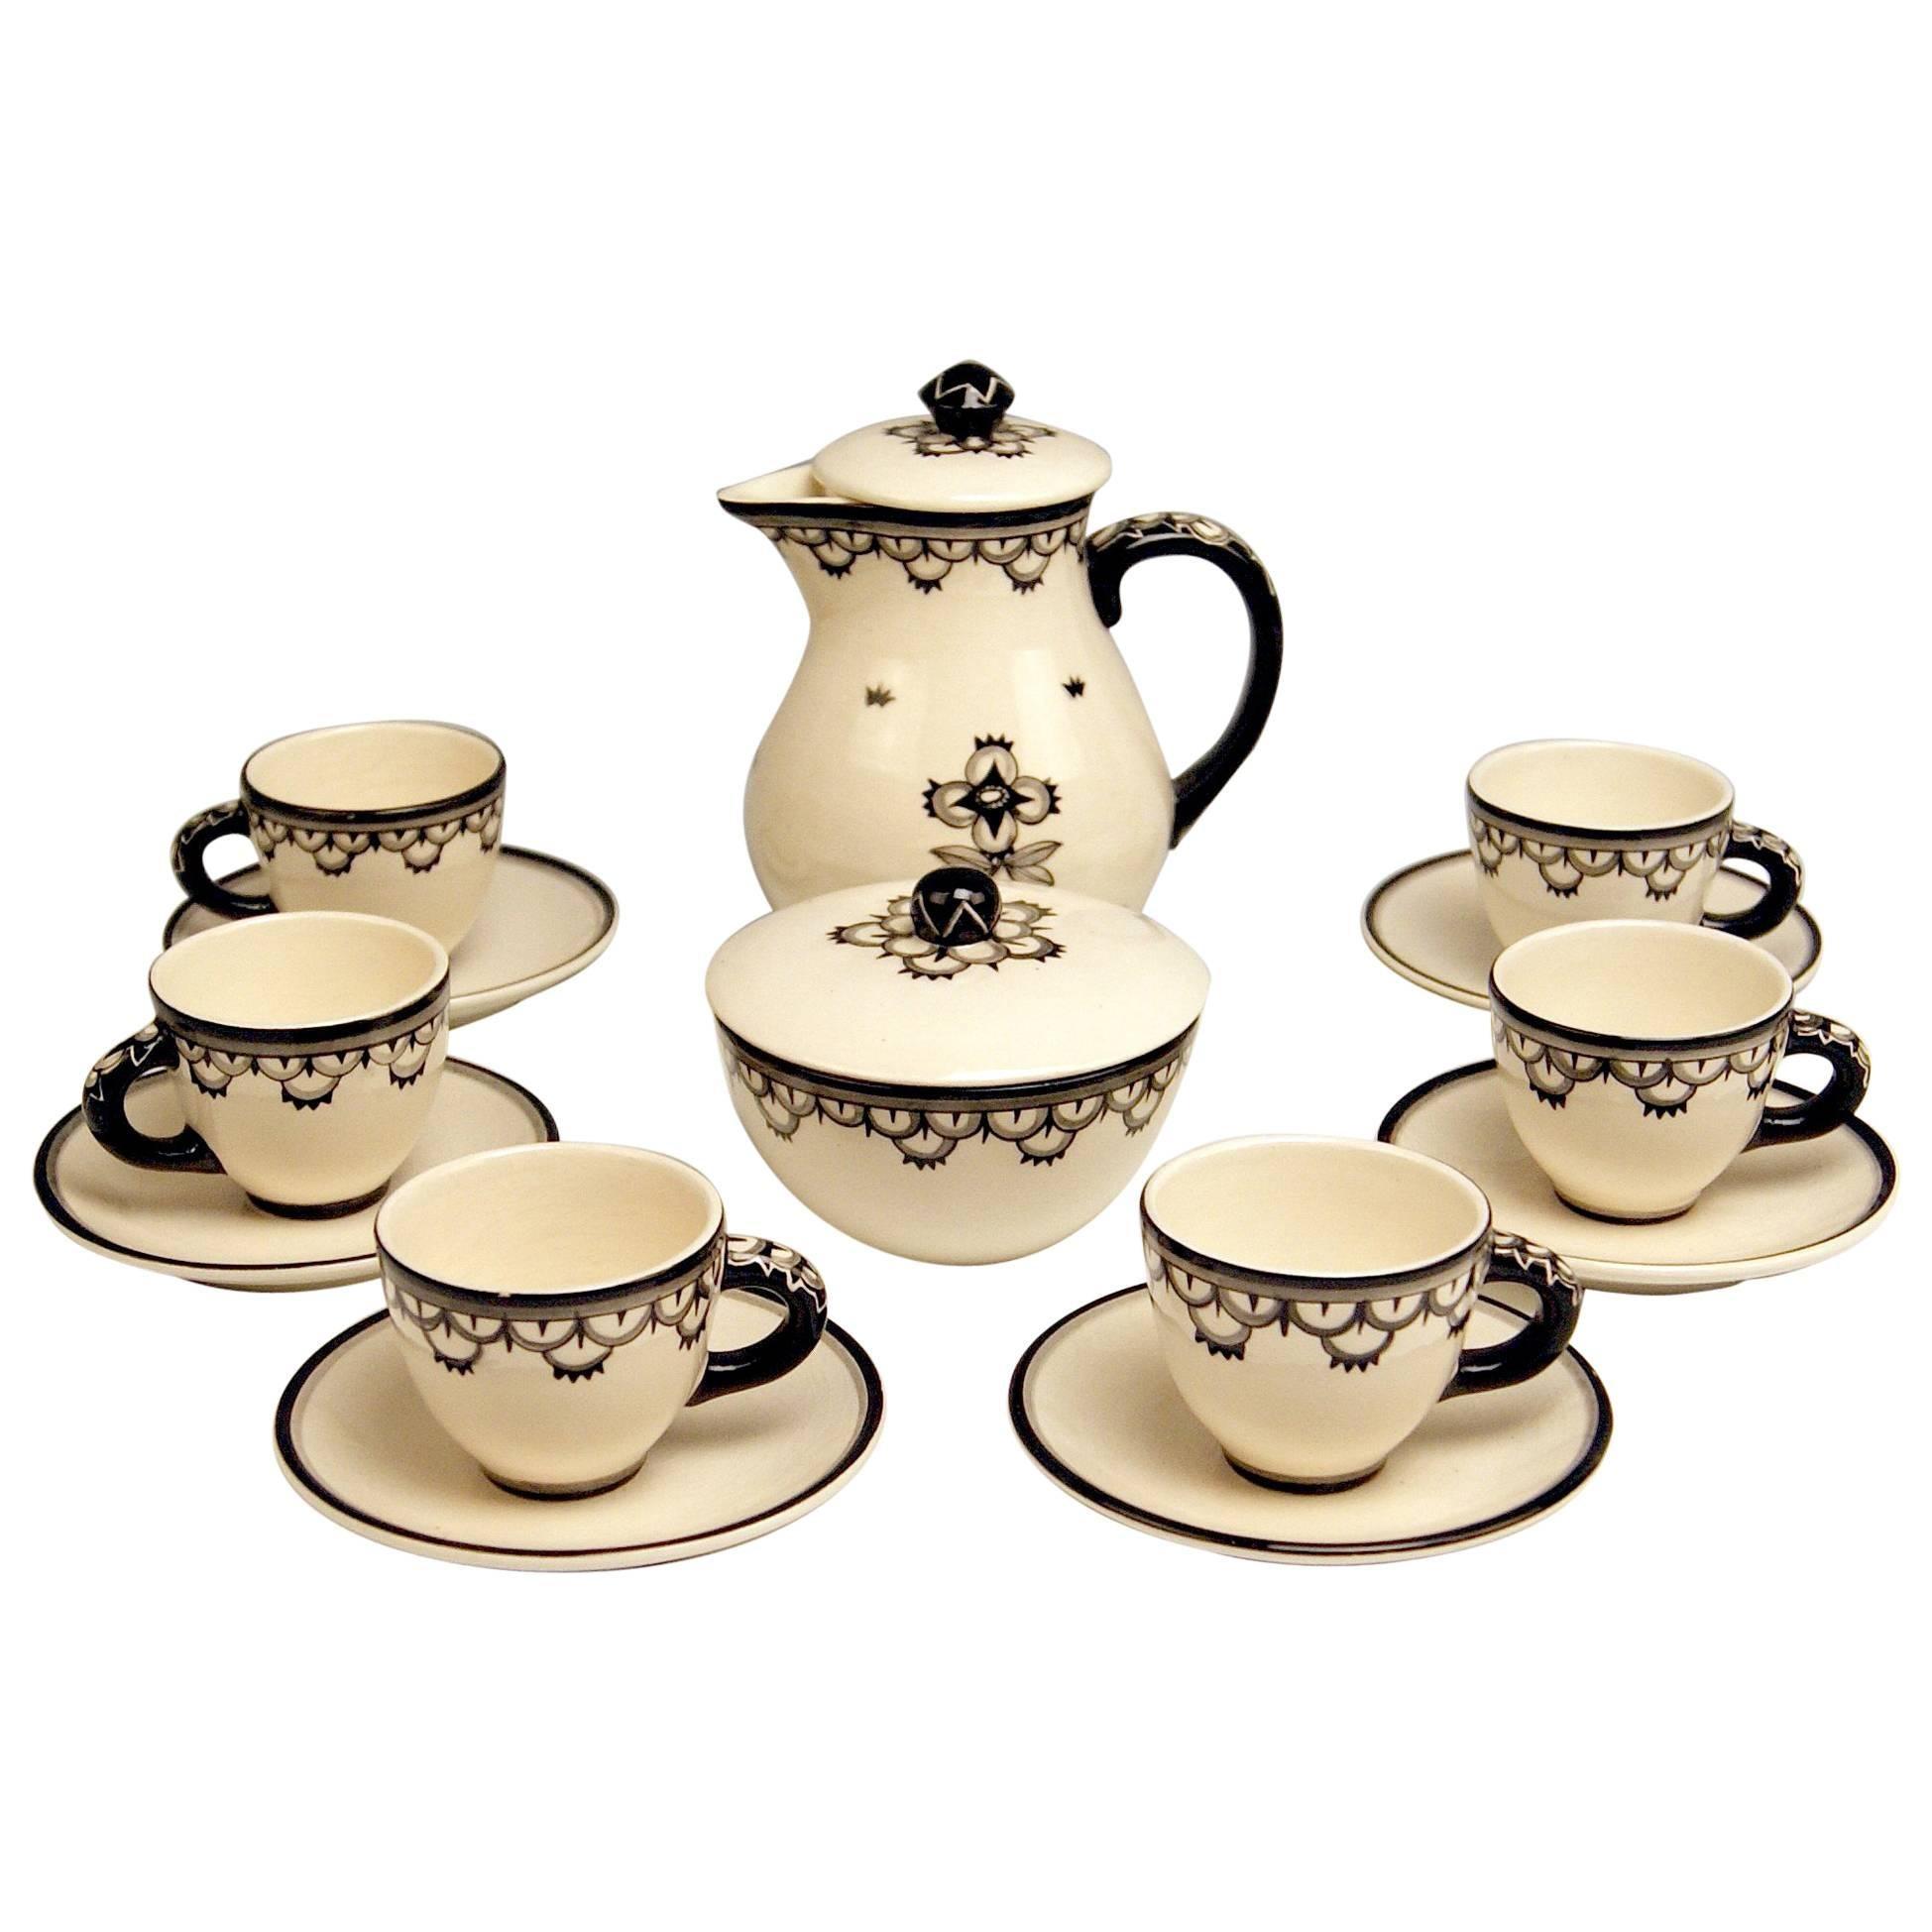 Mocha Set Dagobert Peche Circle Gmunden Ceramics Made, circa 1919